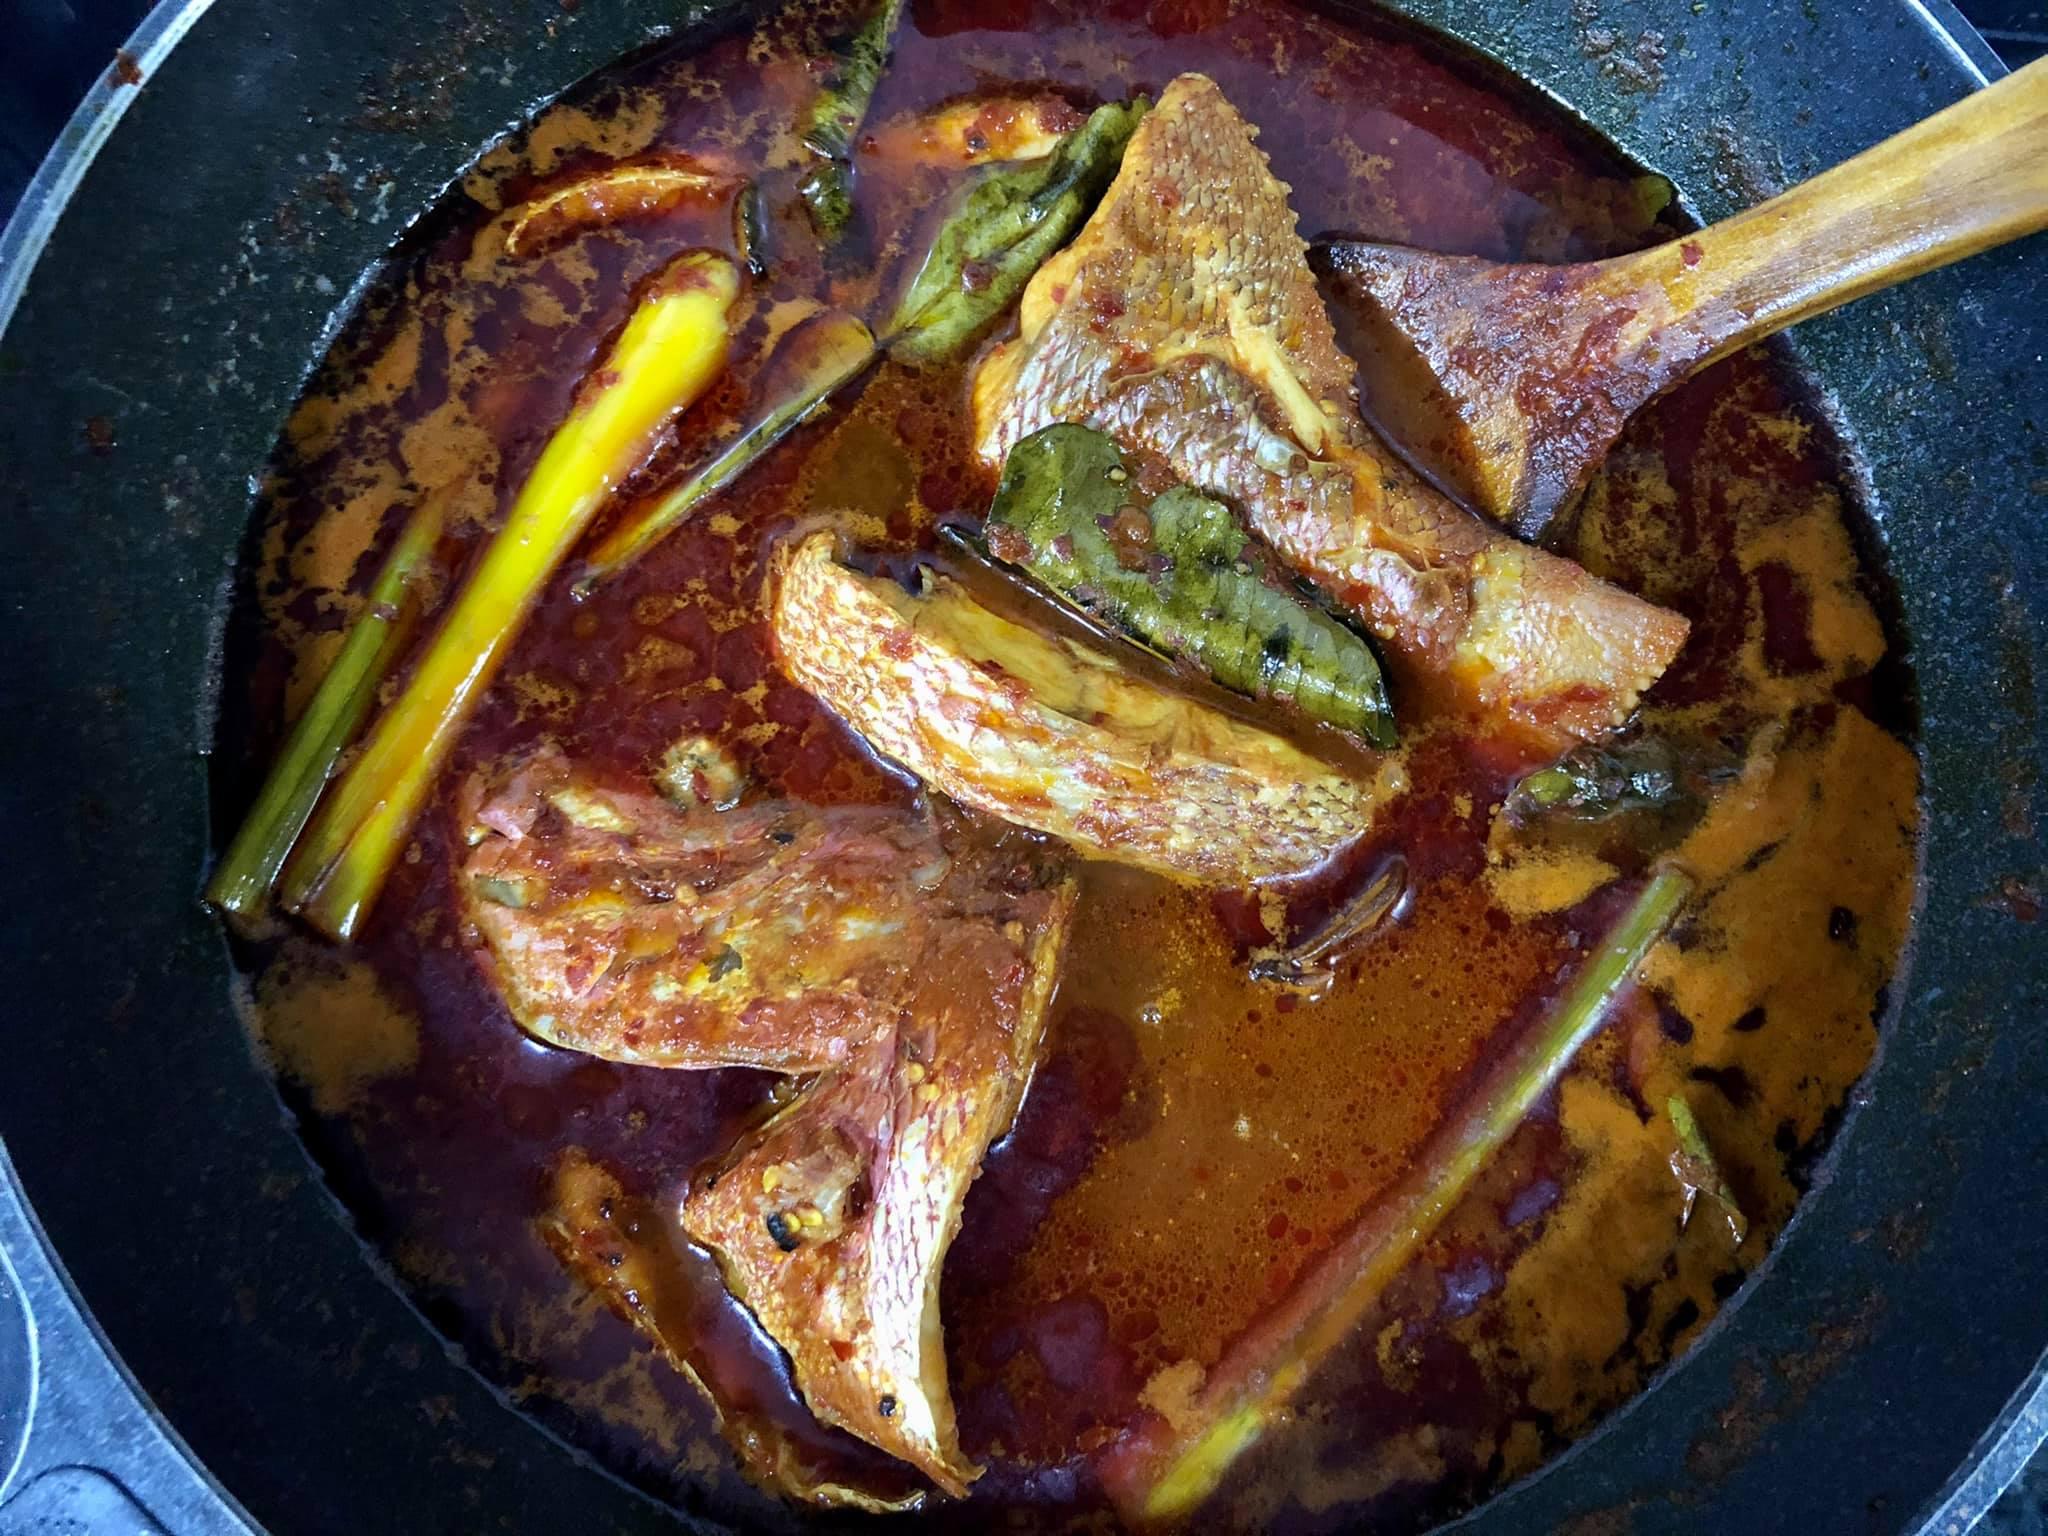 resepi asam pedas ikan club resep hekeng club masak resep masakan indonesia masakan cute Resepi Ikan Masak Asam Halia Enak dan Mudah